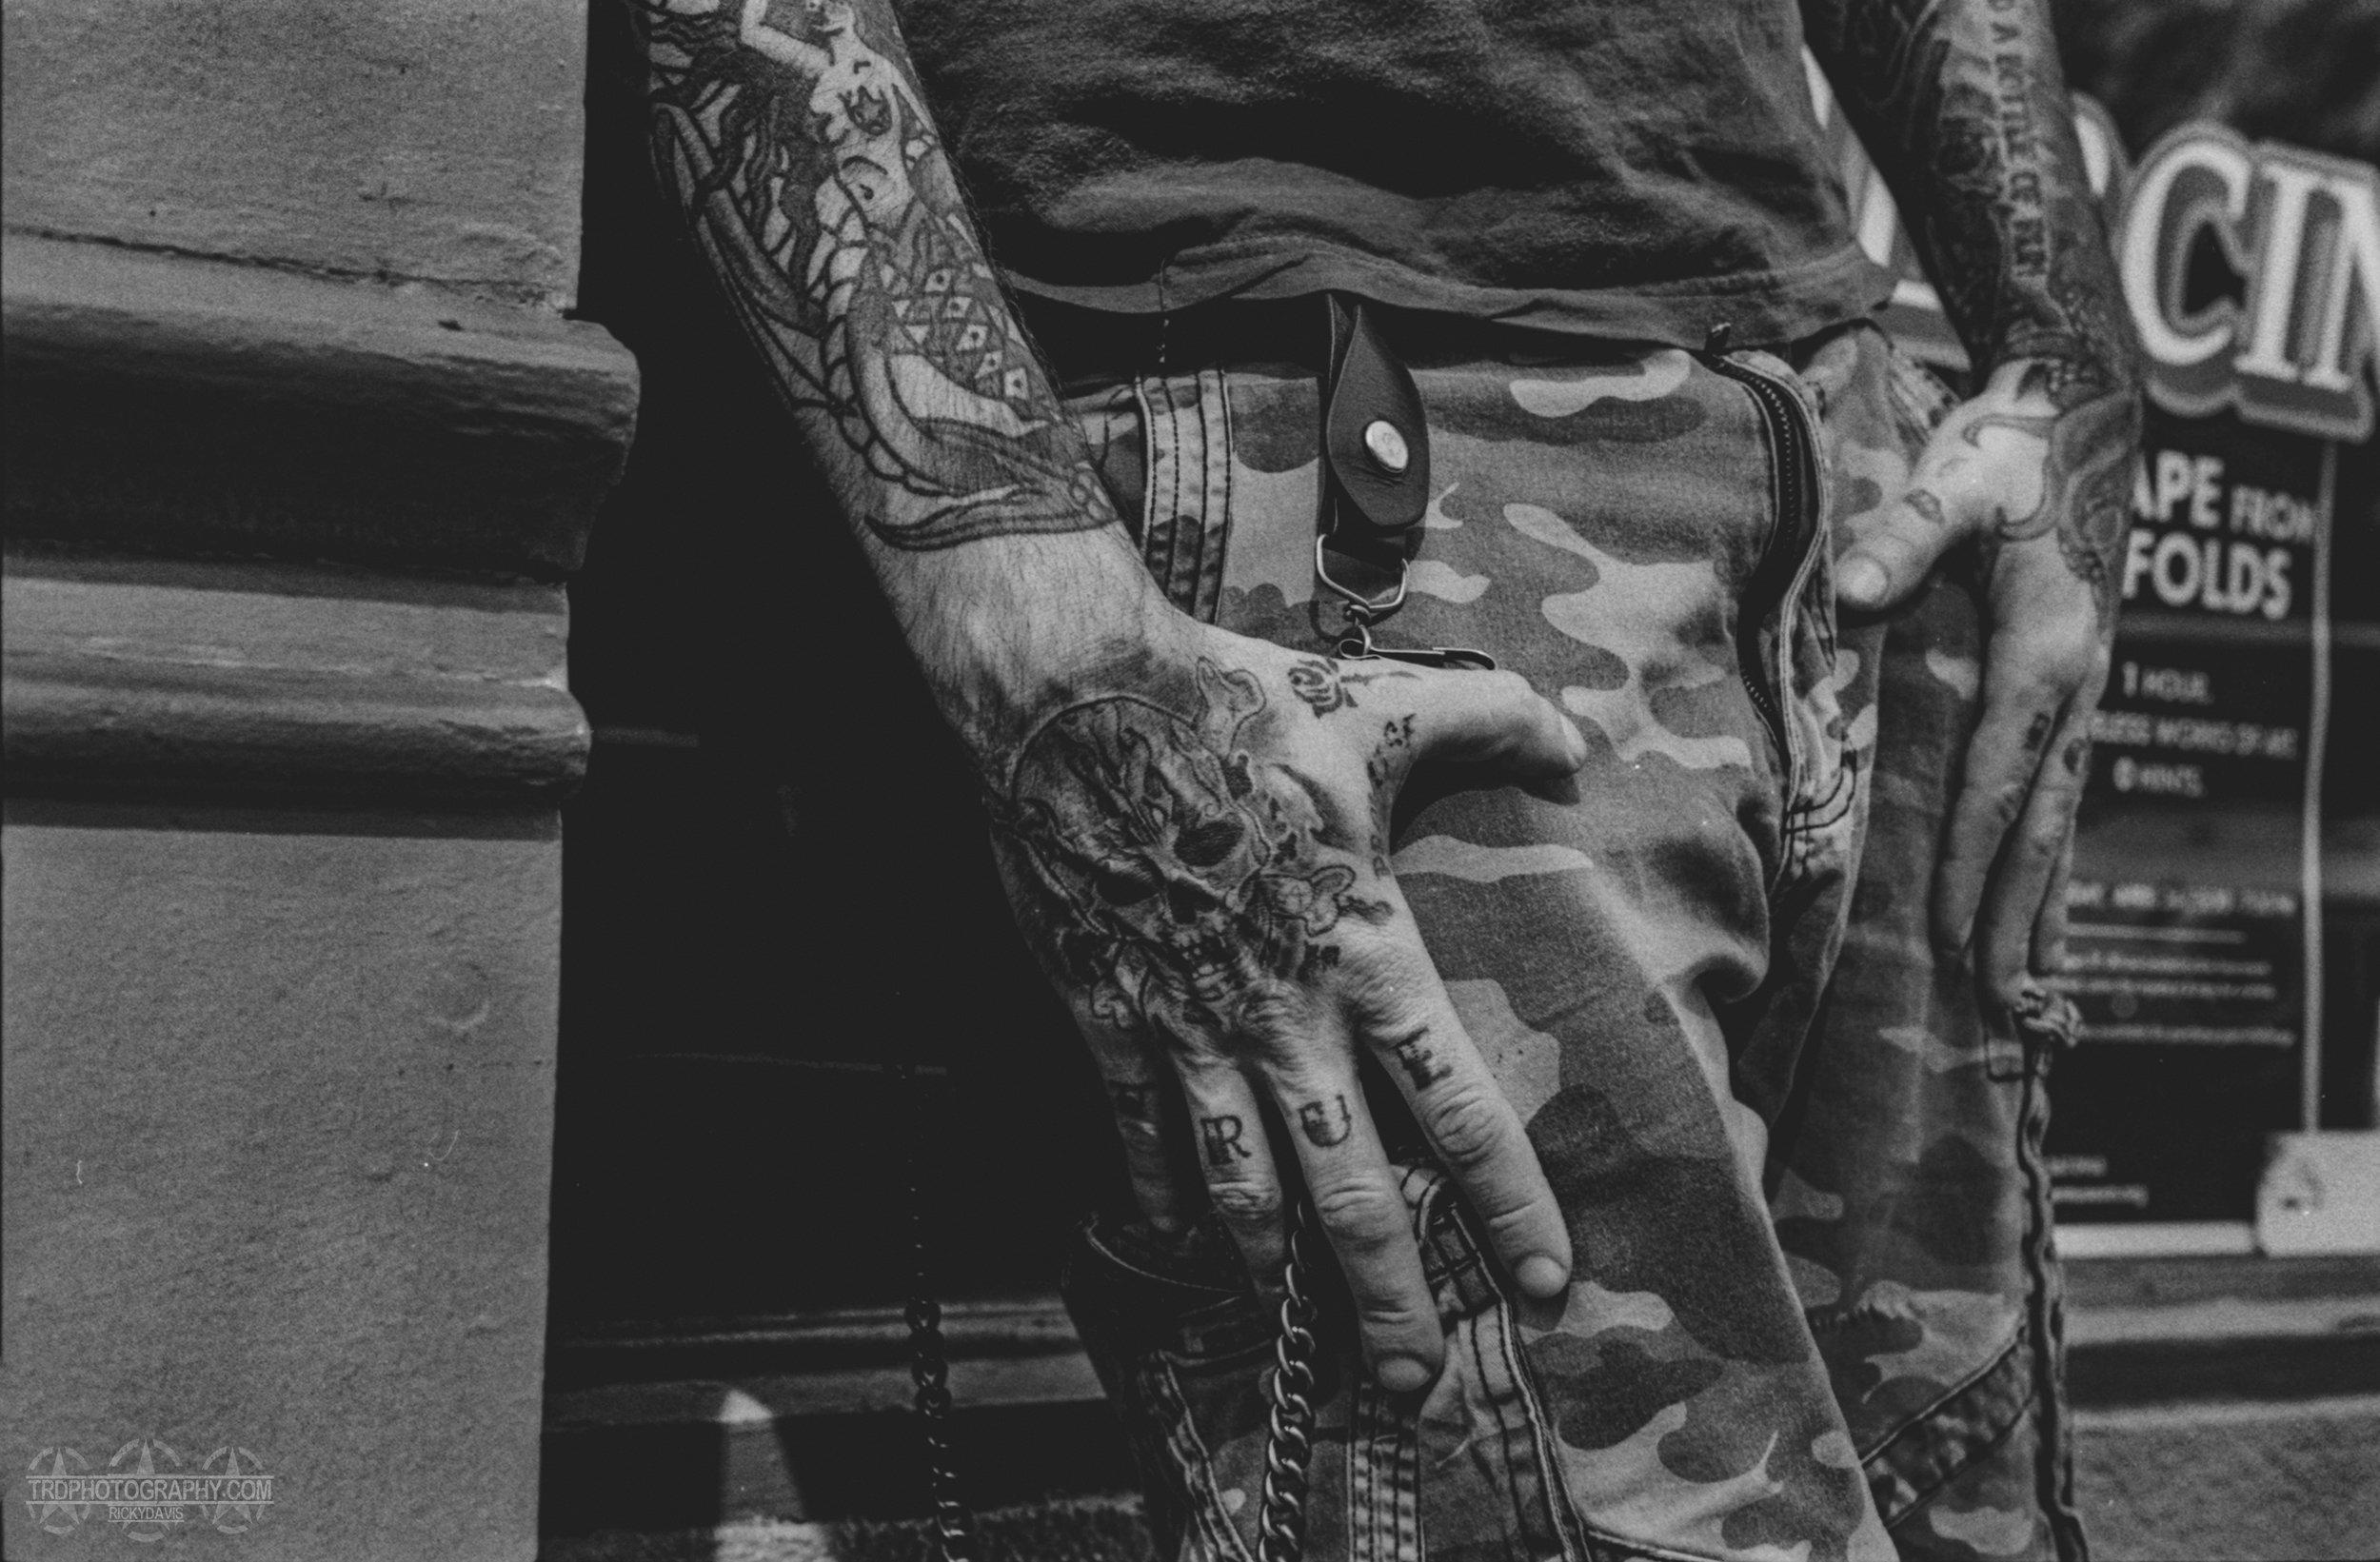 Tattoo Artist Kenneth Chope - TRD Photography